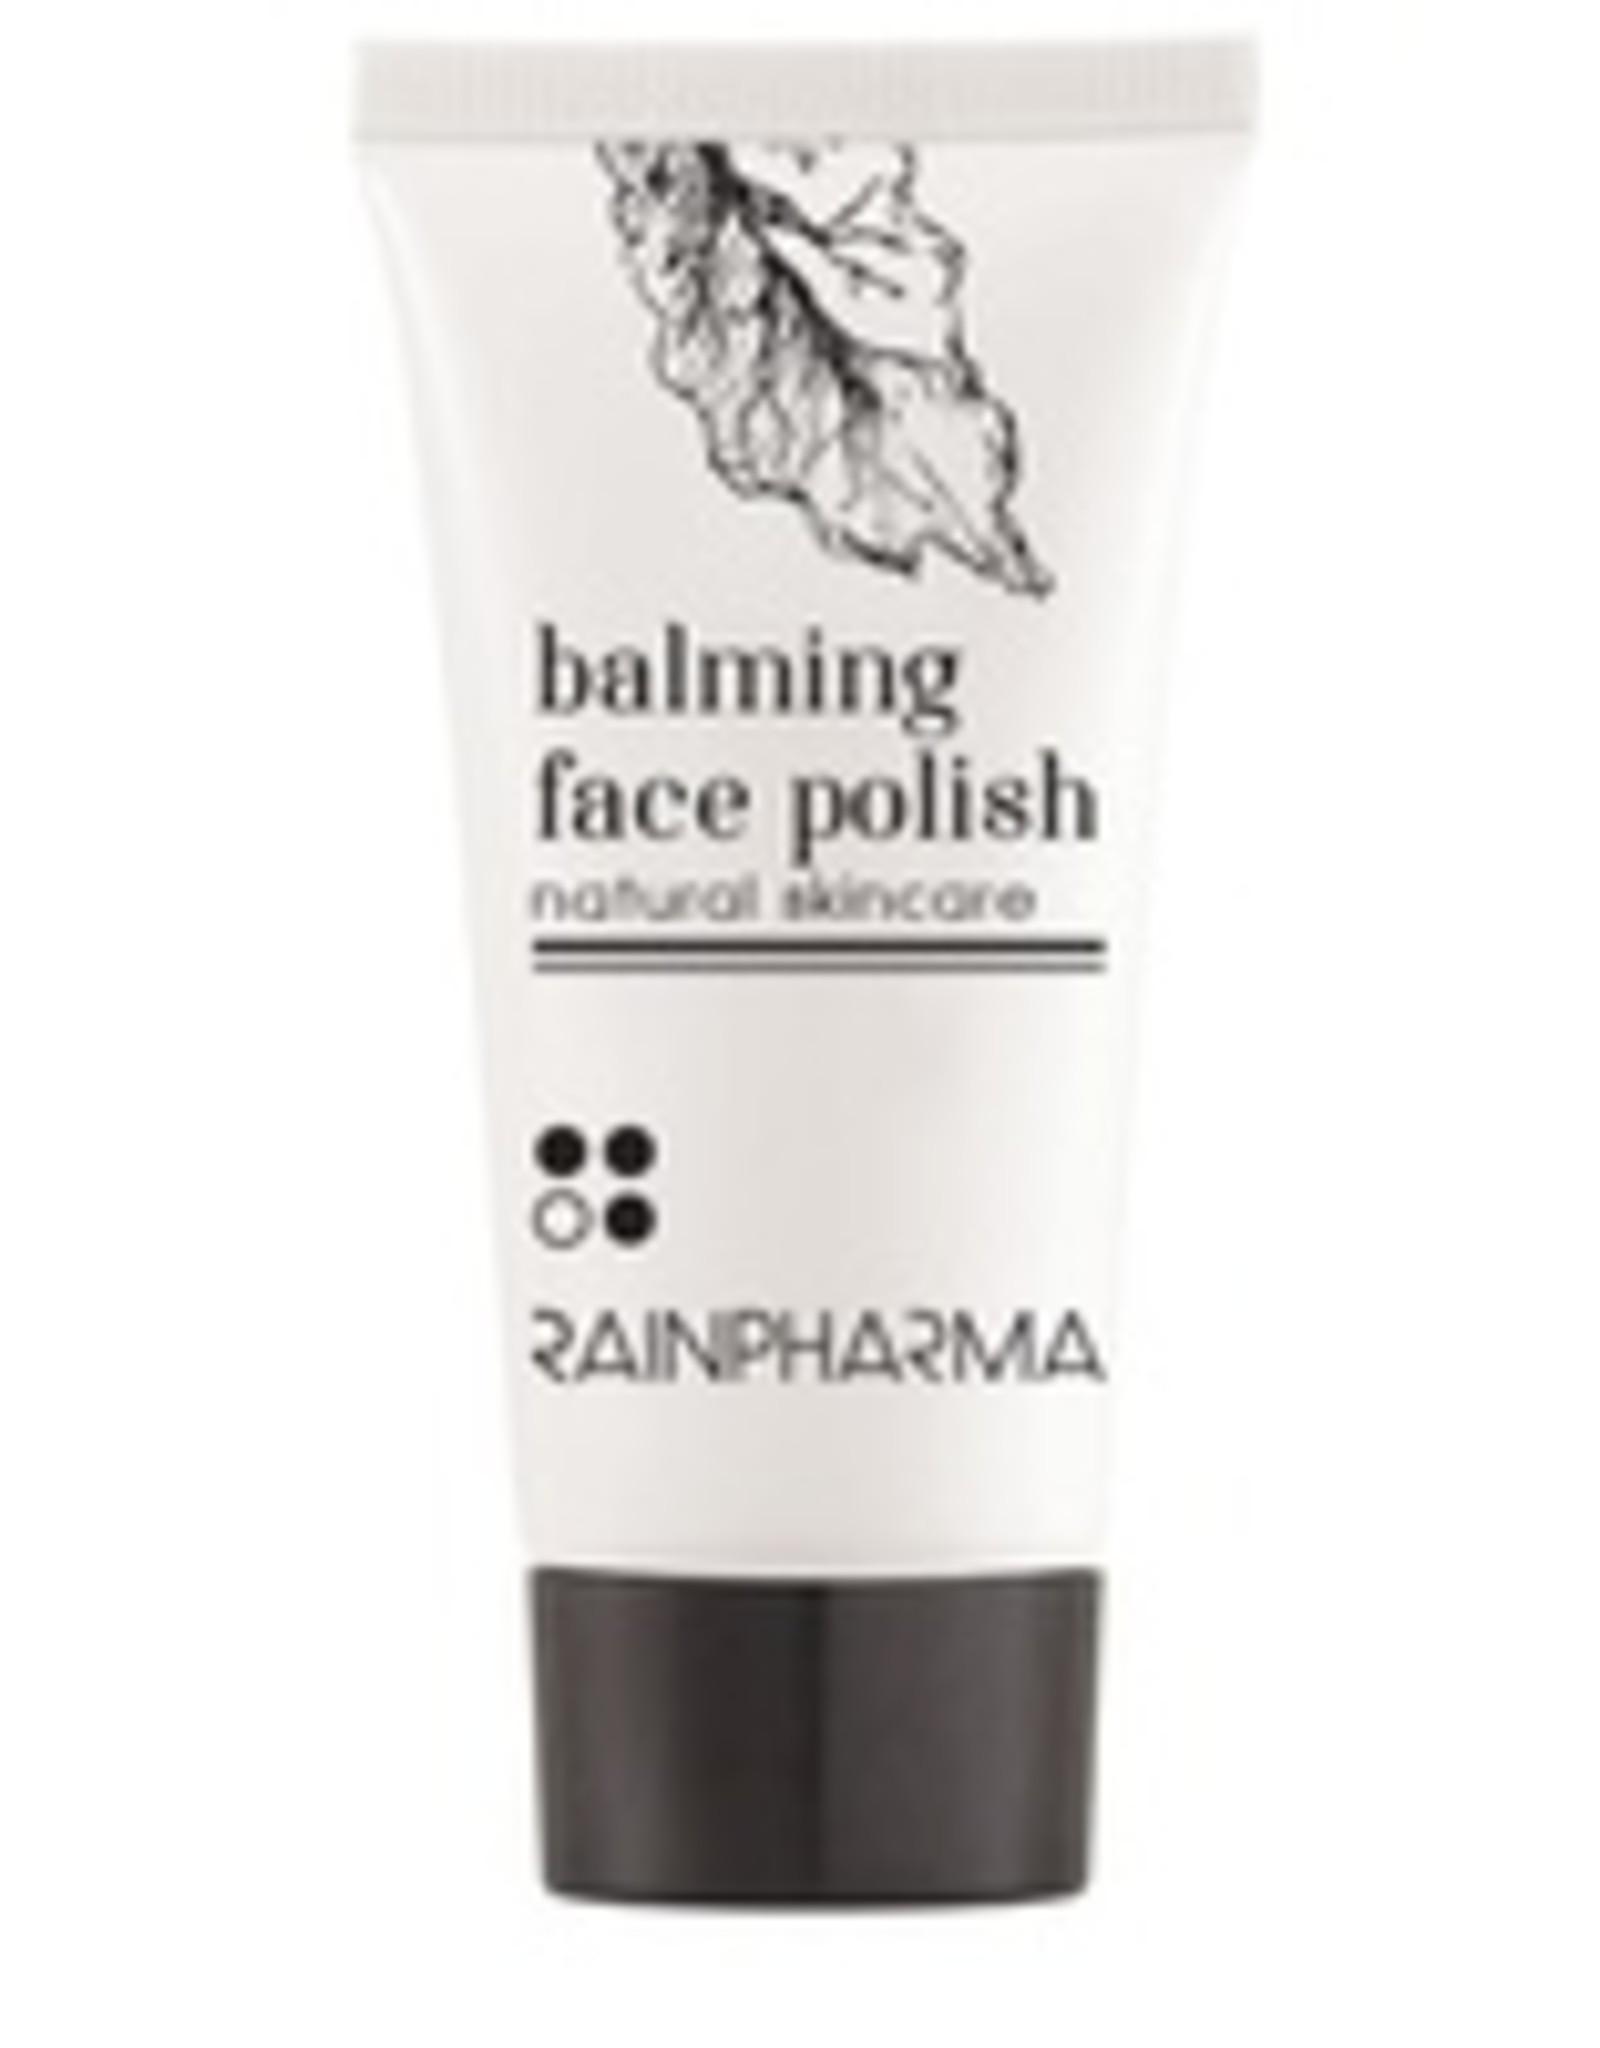 RainPharma TRAVEL - Balming Face Polish 20ml - Rainpharma